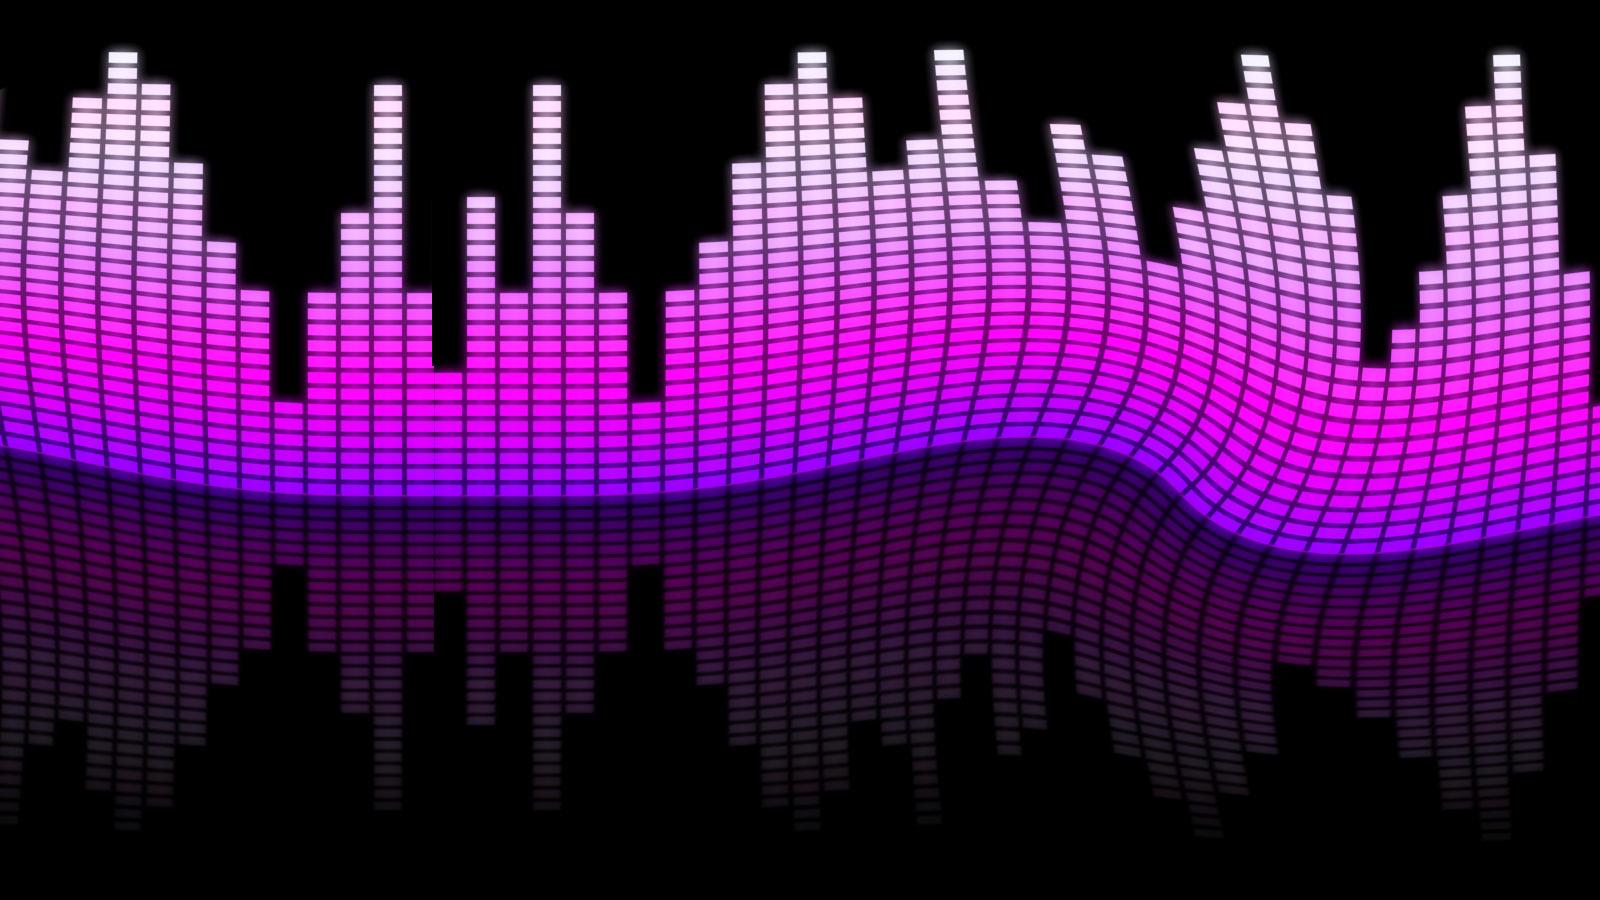 Audio Waves Wallpaper Sound waves twitter 1600x900